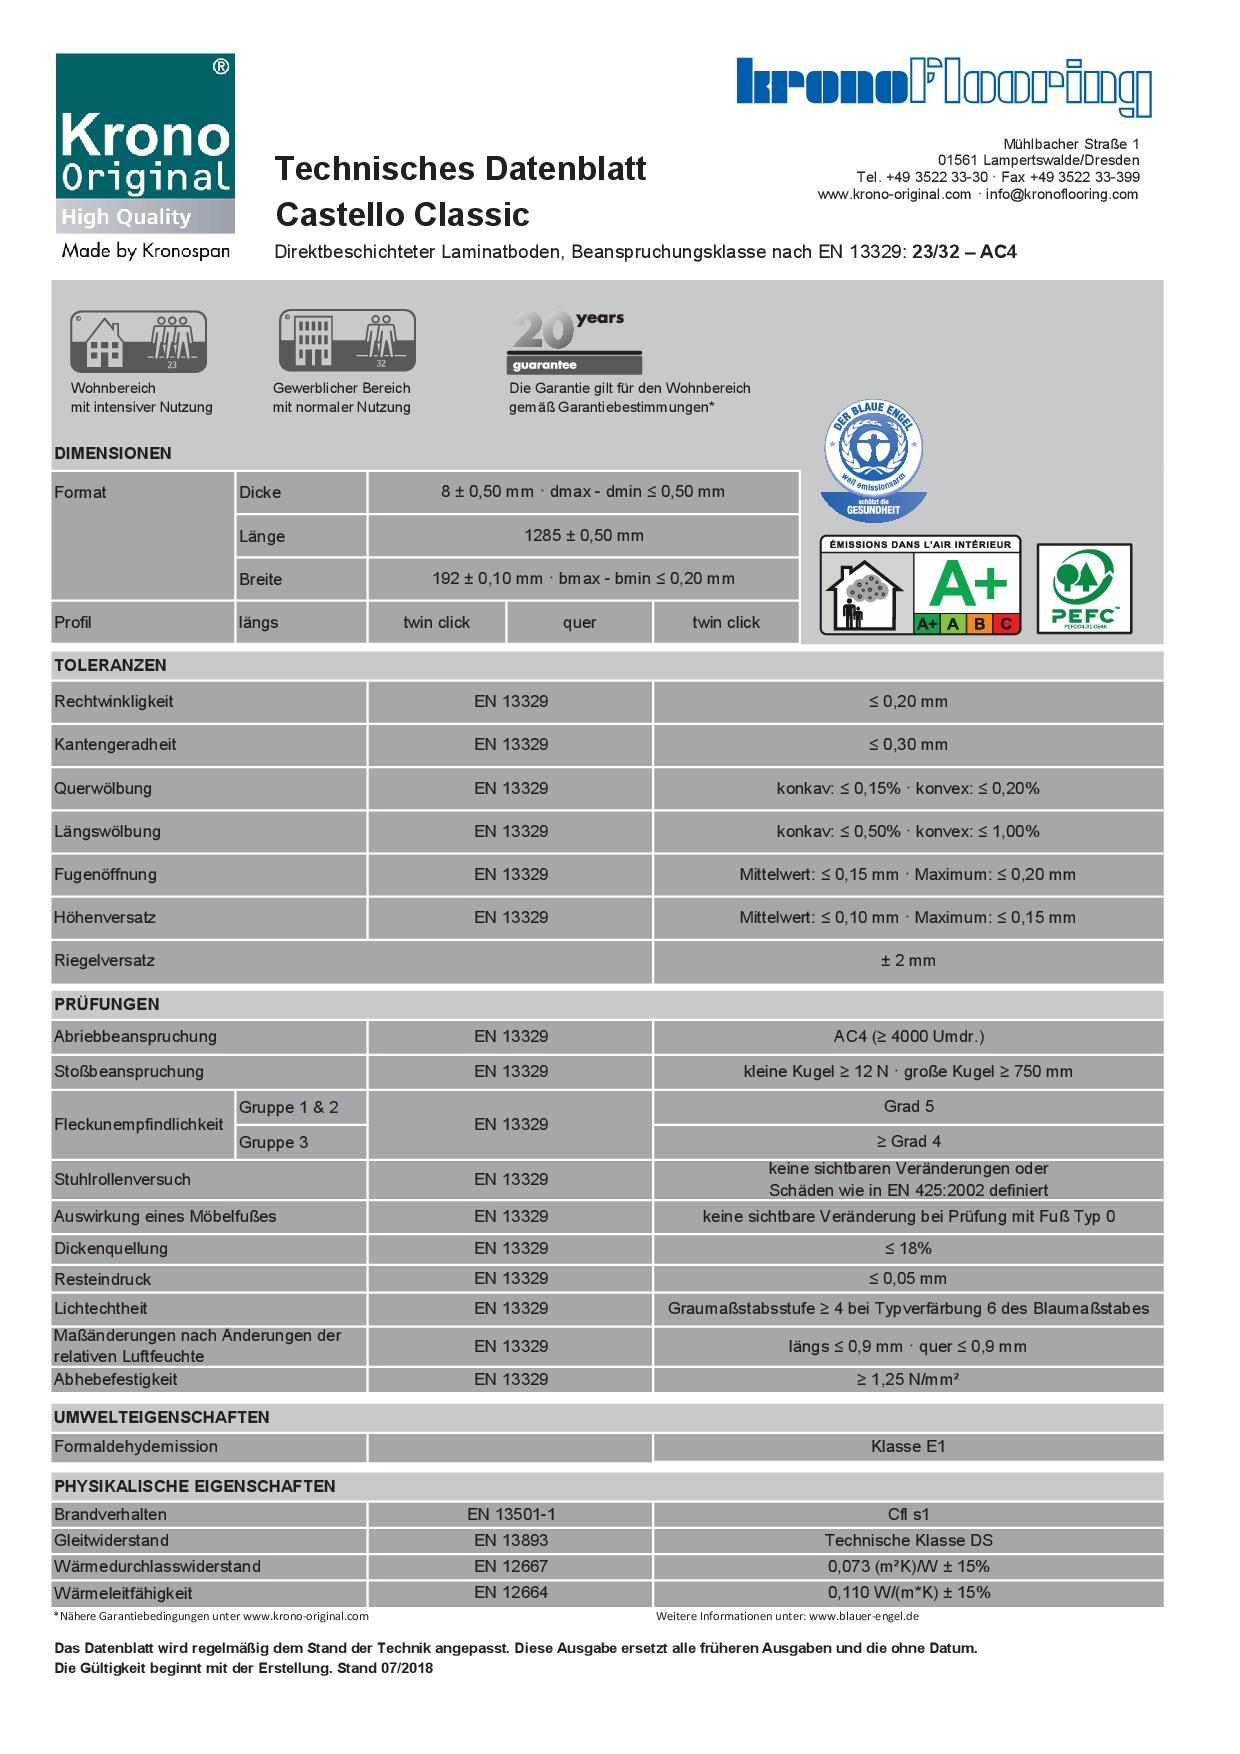 4-1_Technisches_Datenblatt_Castello_Classic_dt-jpg